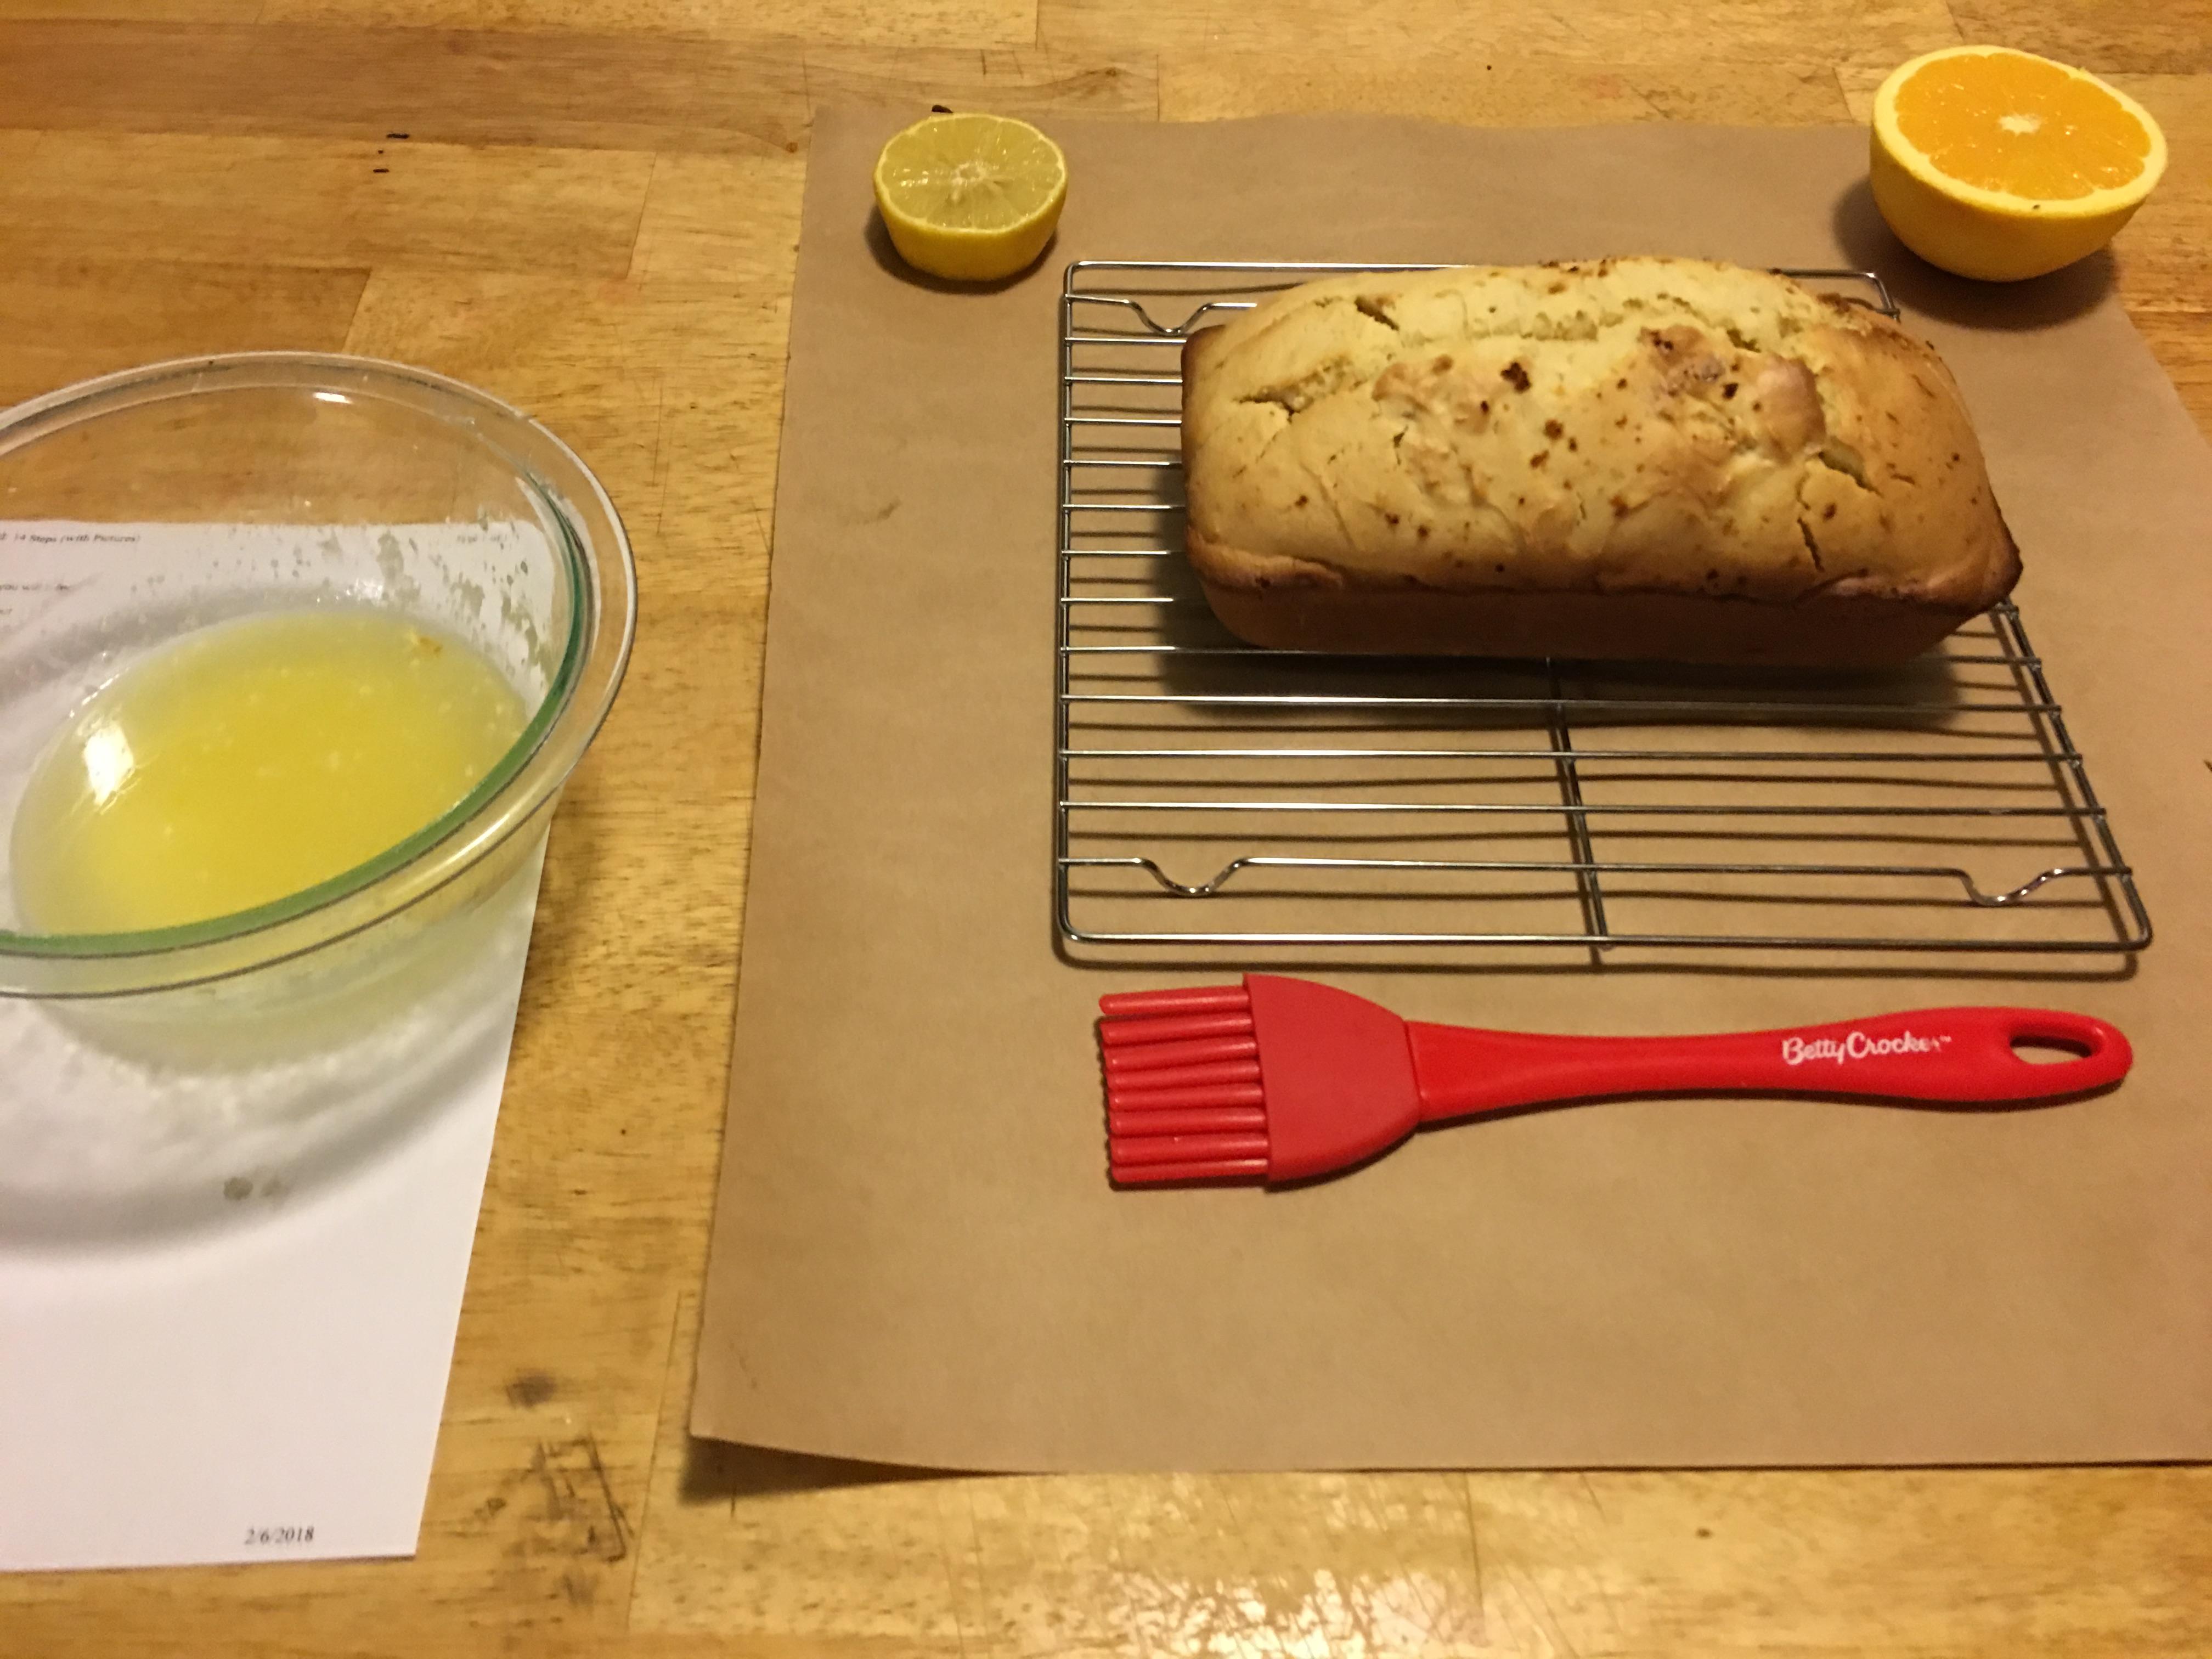 How to Make Orange Bread